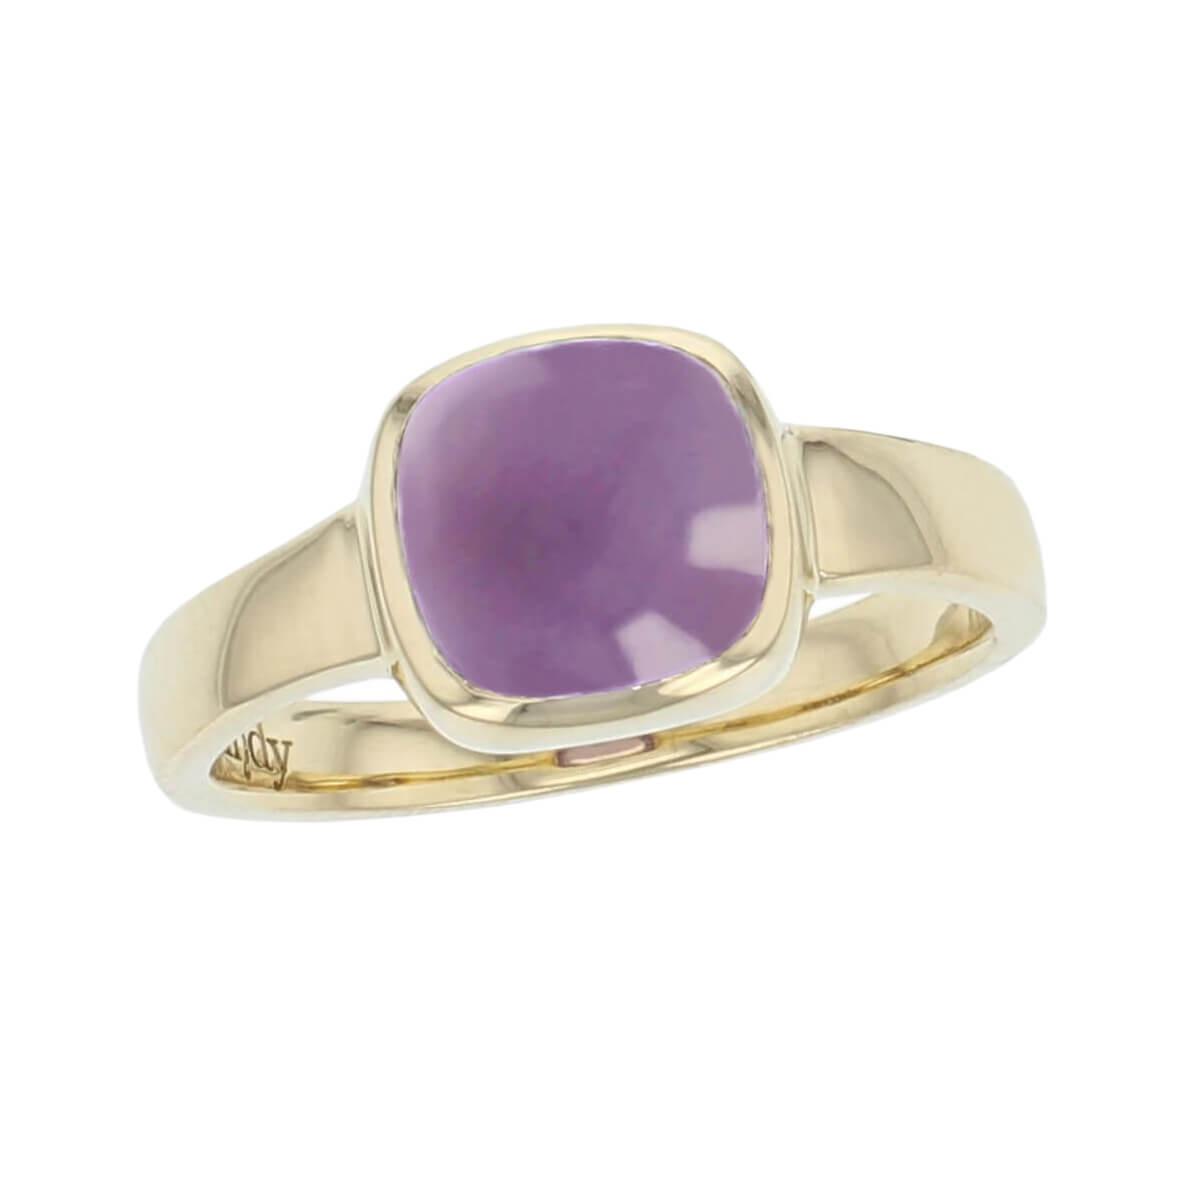 18ct yellow gold purple cushion cut cabochon amethyst gemstone dress ring, designer jewellery, quartz gem, jewelry, handmade by Faller, Londonderry, Northern Ireland, Irish hand crafted, Kandy